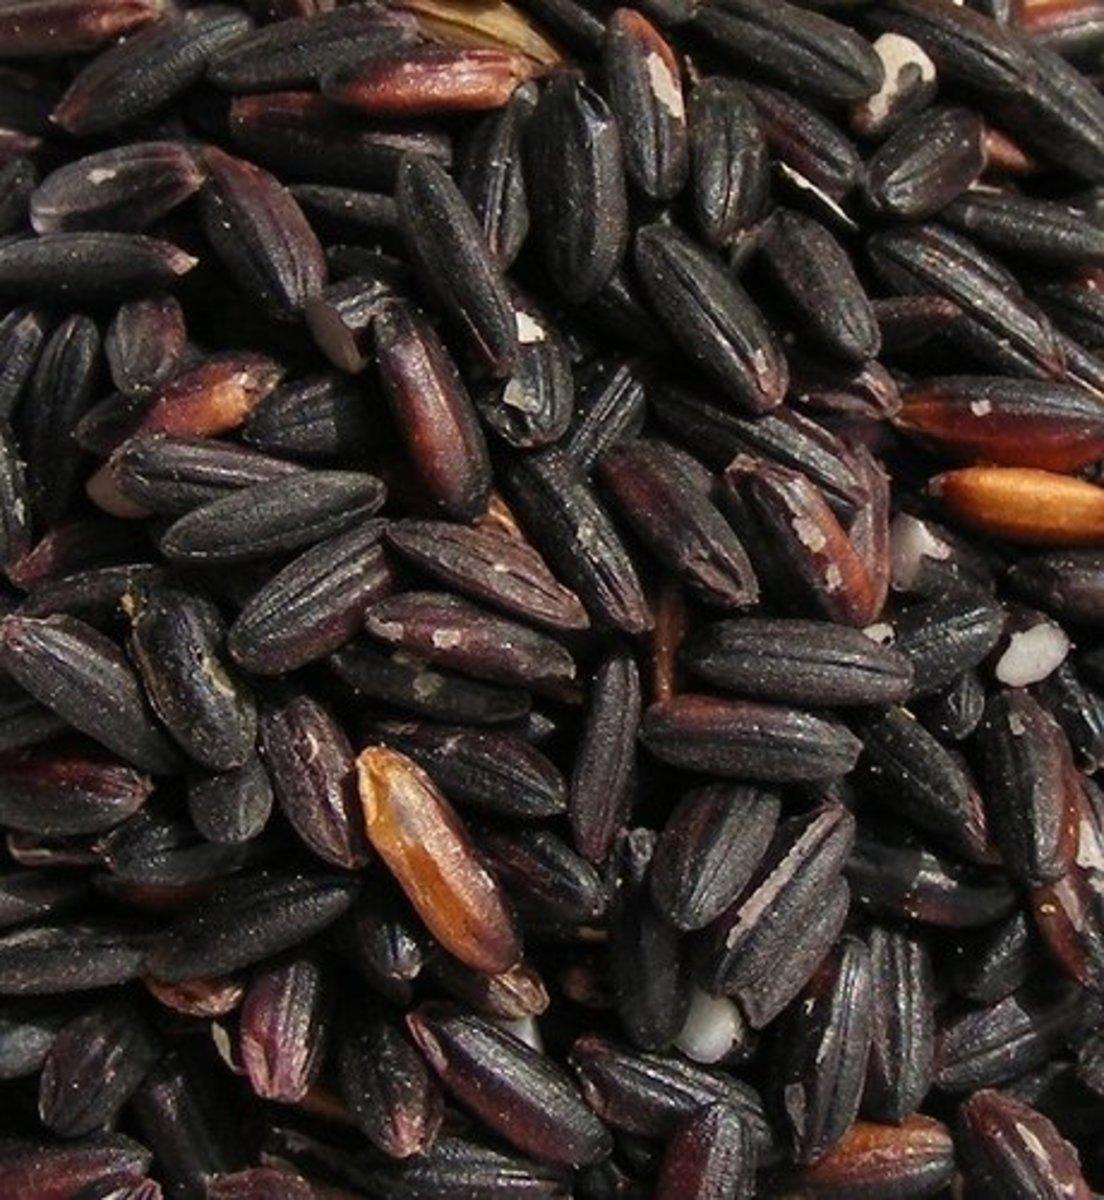 Black Glutinous Rice (Photo courtesy by FotoosVanRobin from Flickr.com)